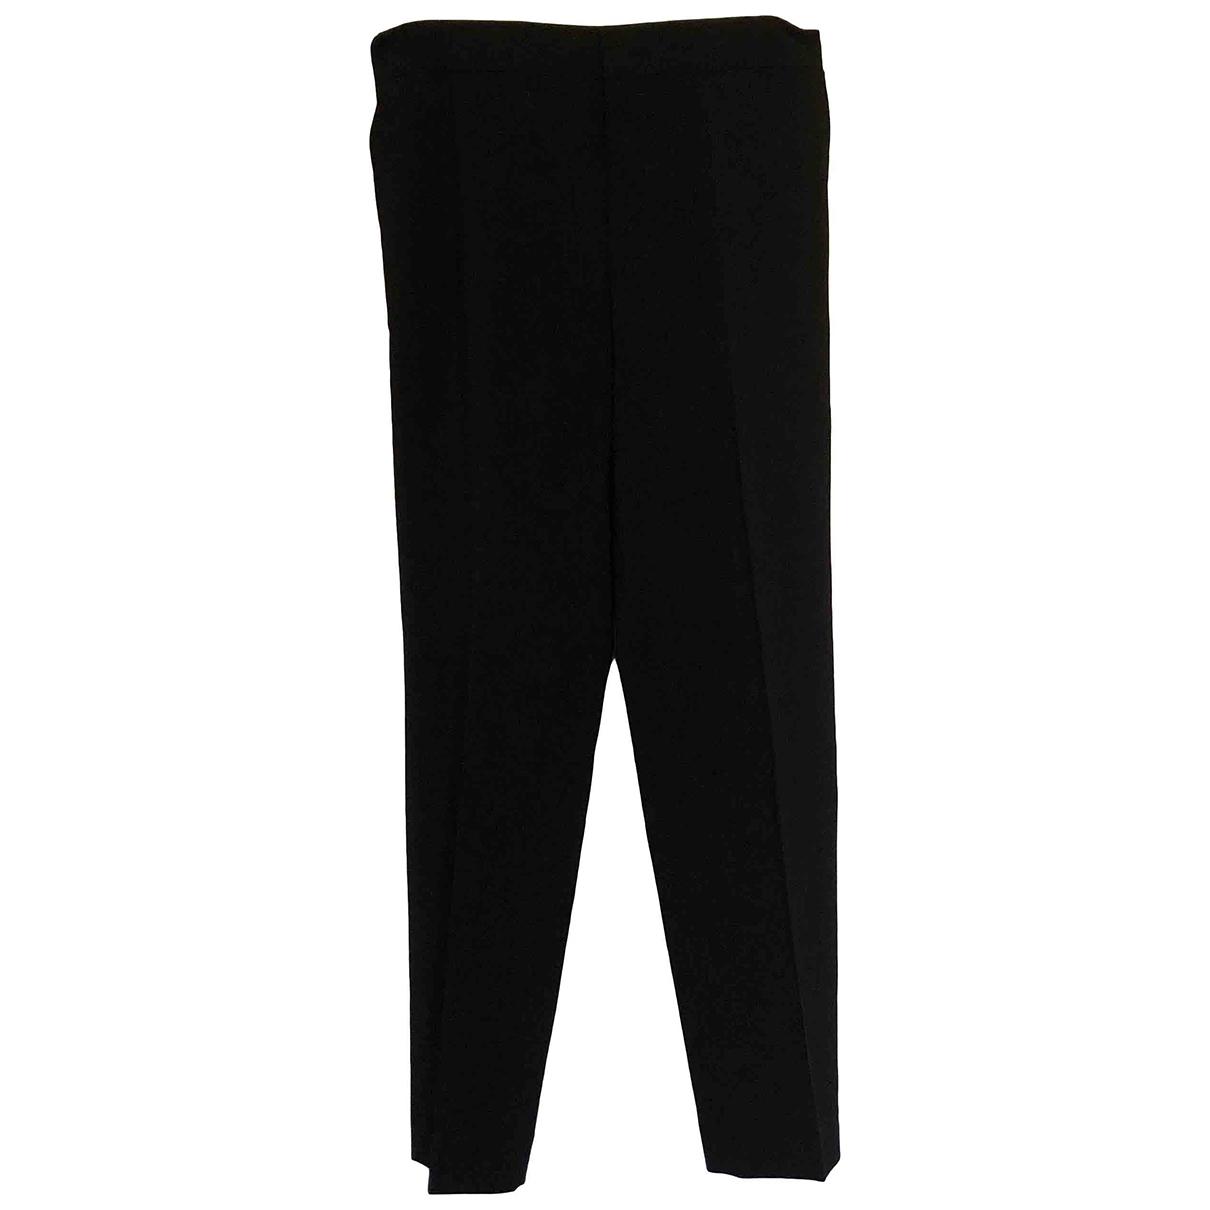 Chloé \N Black Wool Trousers for Women 36 FR